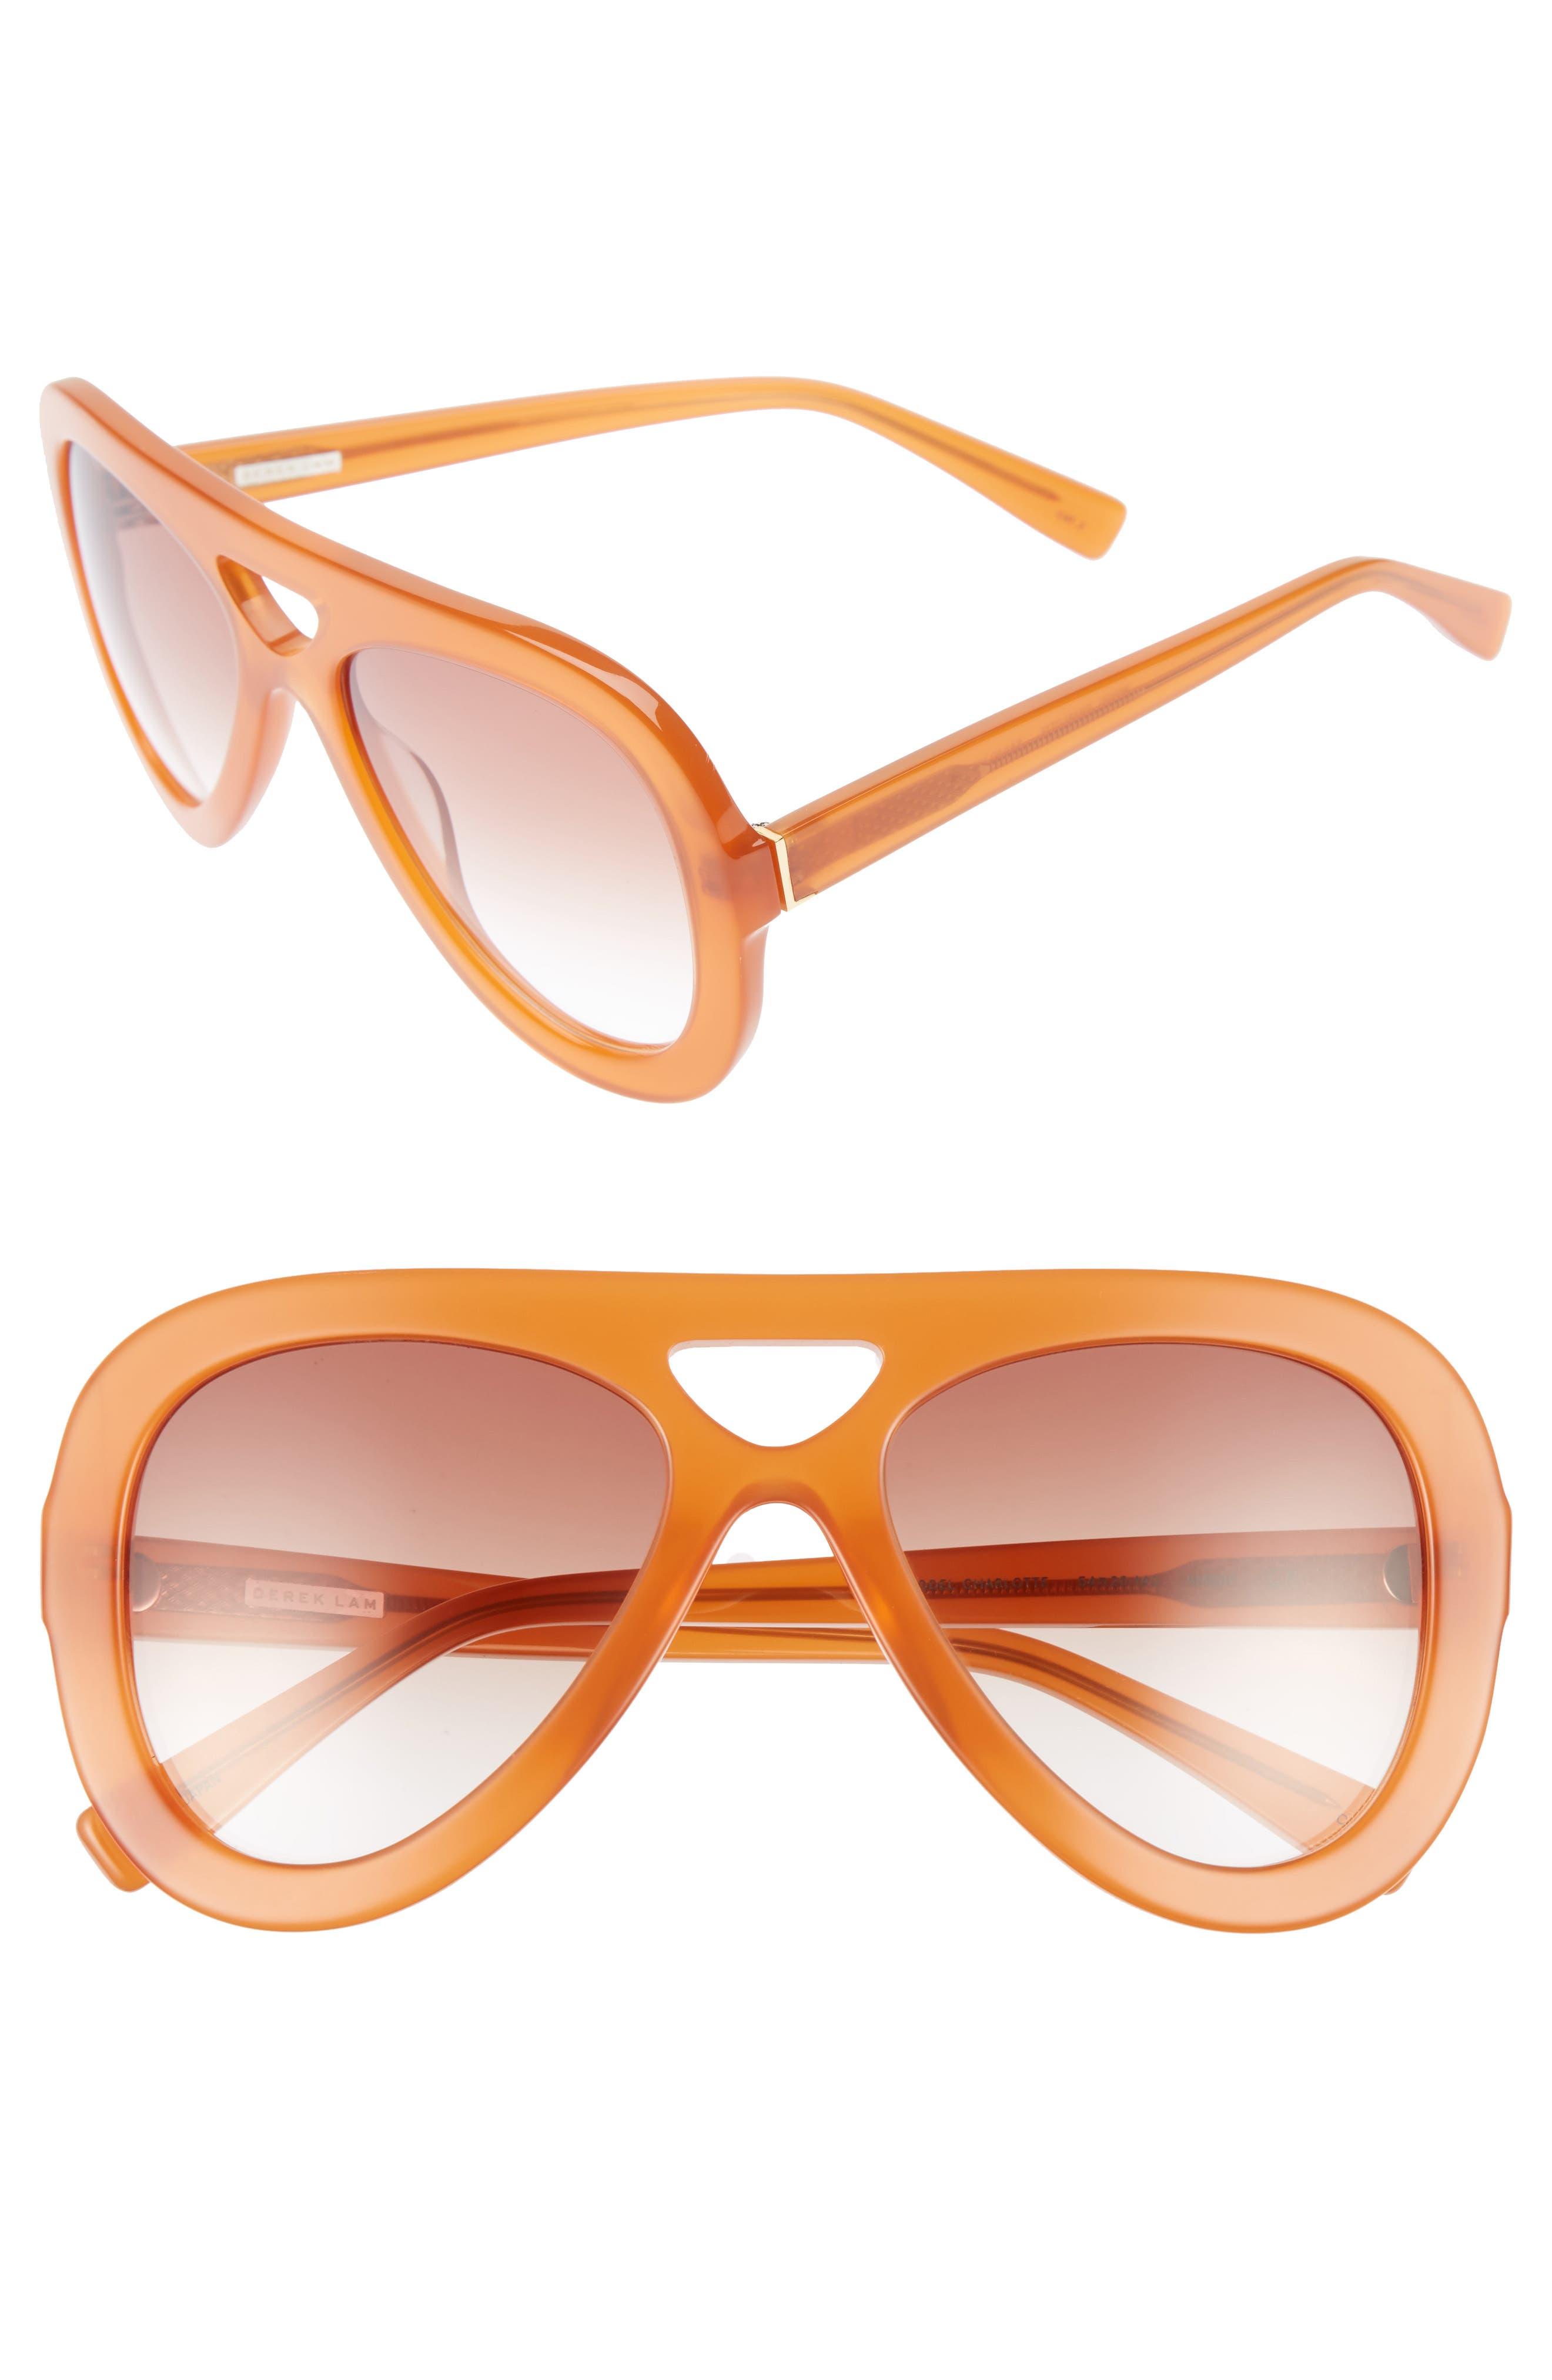 DEREK LAM 54mm Aviator Sunglasses